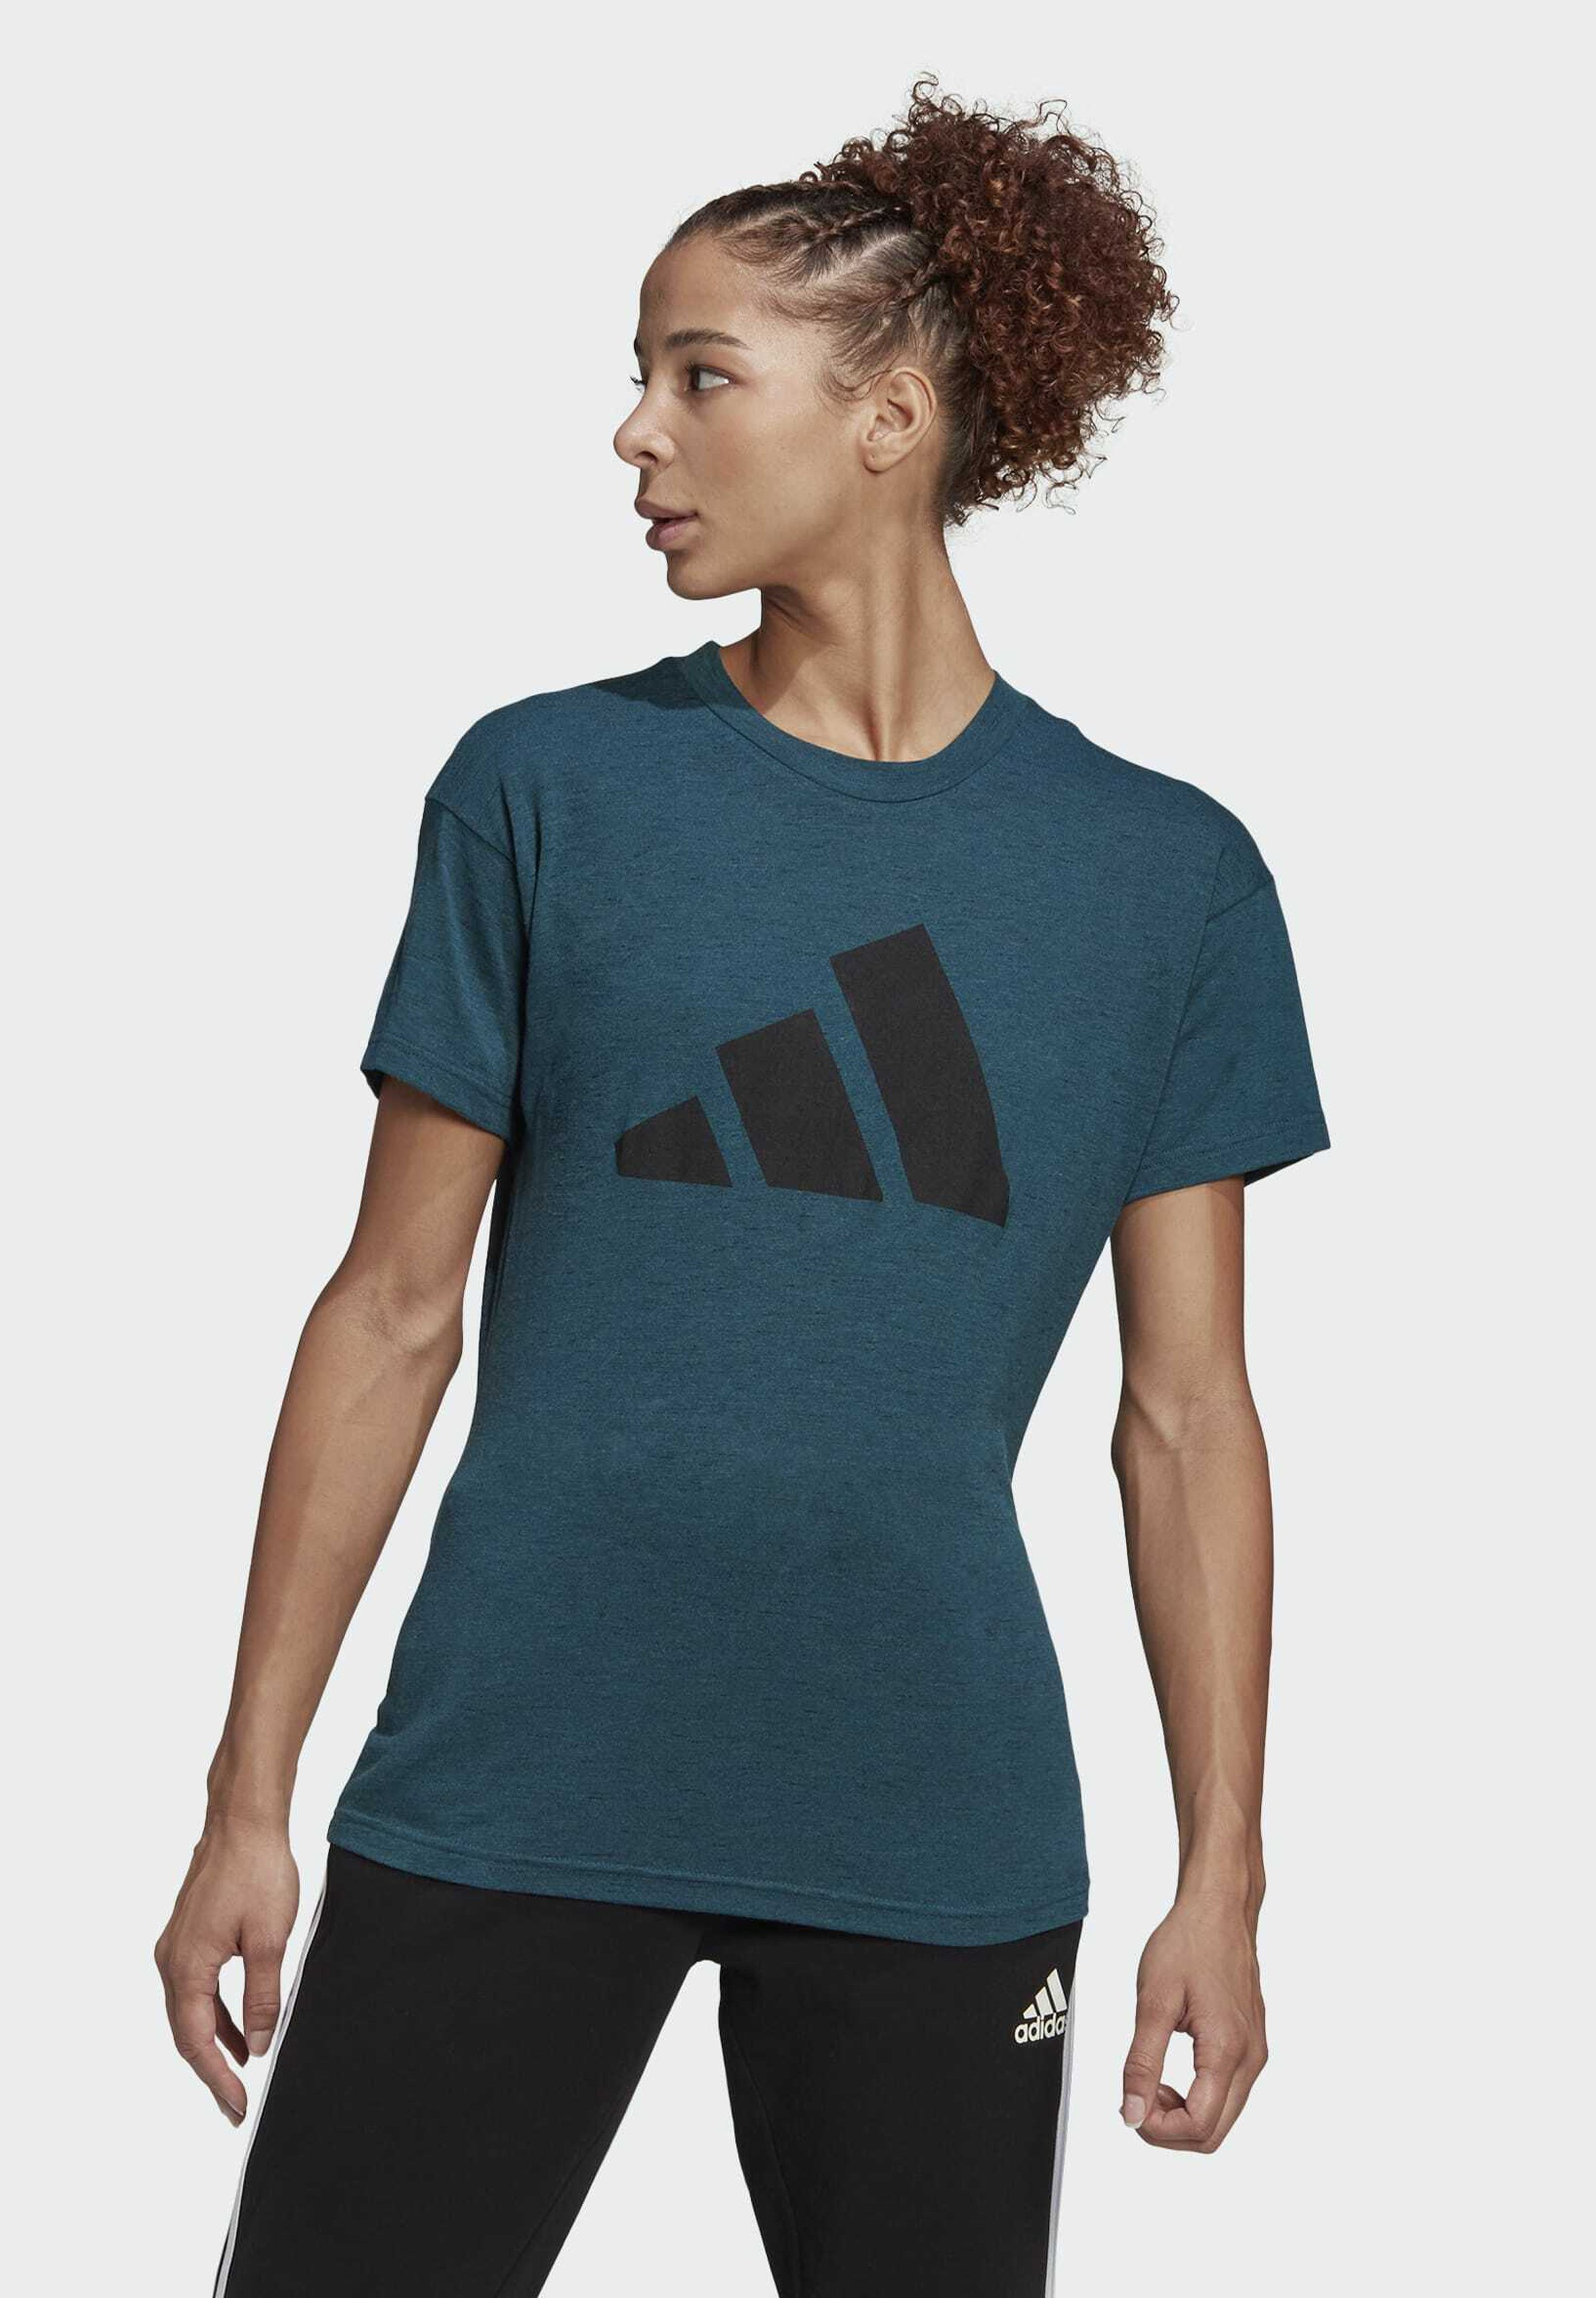 Women ADIDAS SPORTSWEAR WINNERS T-SHIRT 2.0 - Print T-shirt